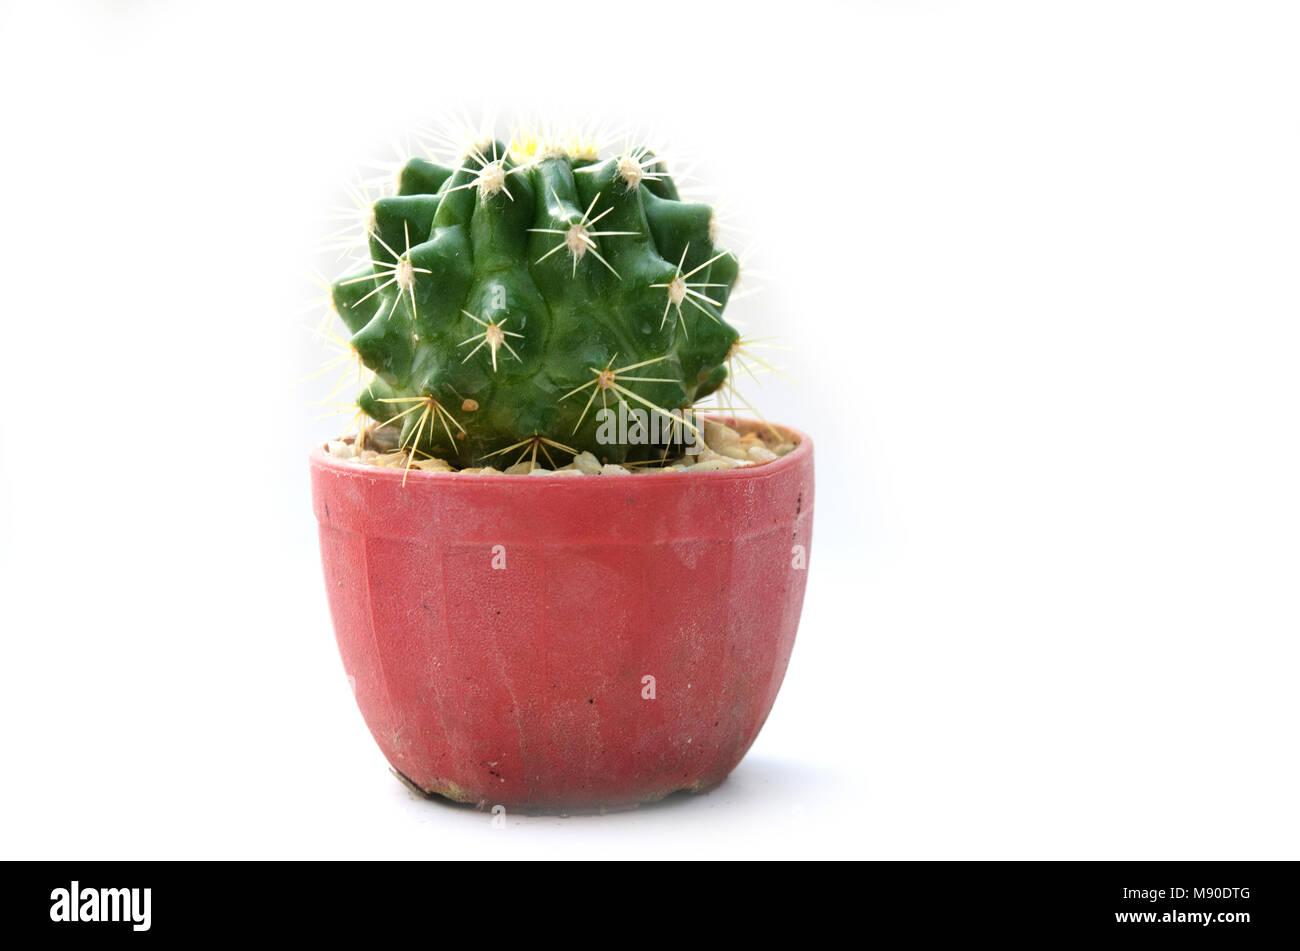 Cactus vintage on the white background. - Stock Image